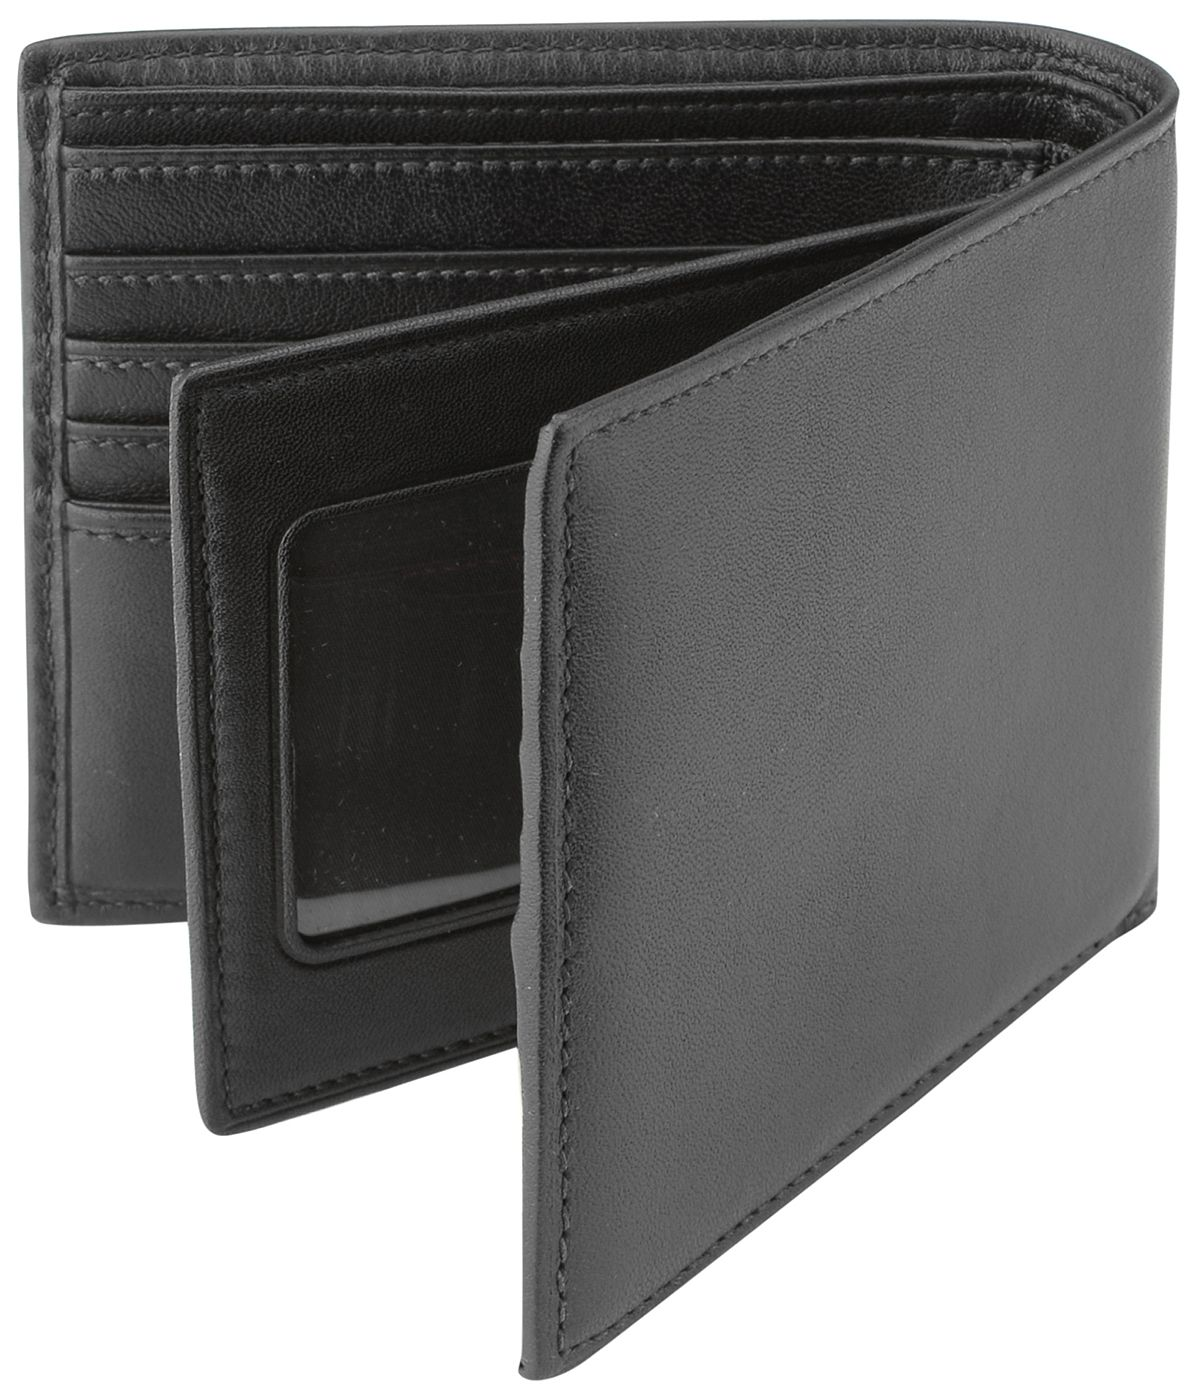 sports shoes eeafa e45e4 Tumi Black Center Flip ID Passcase Wallet